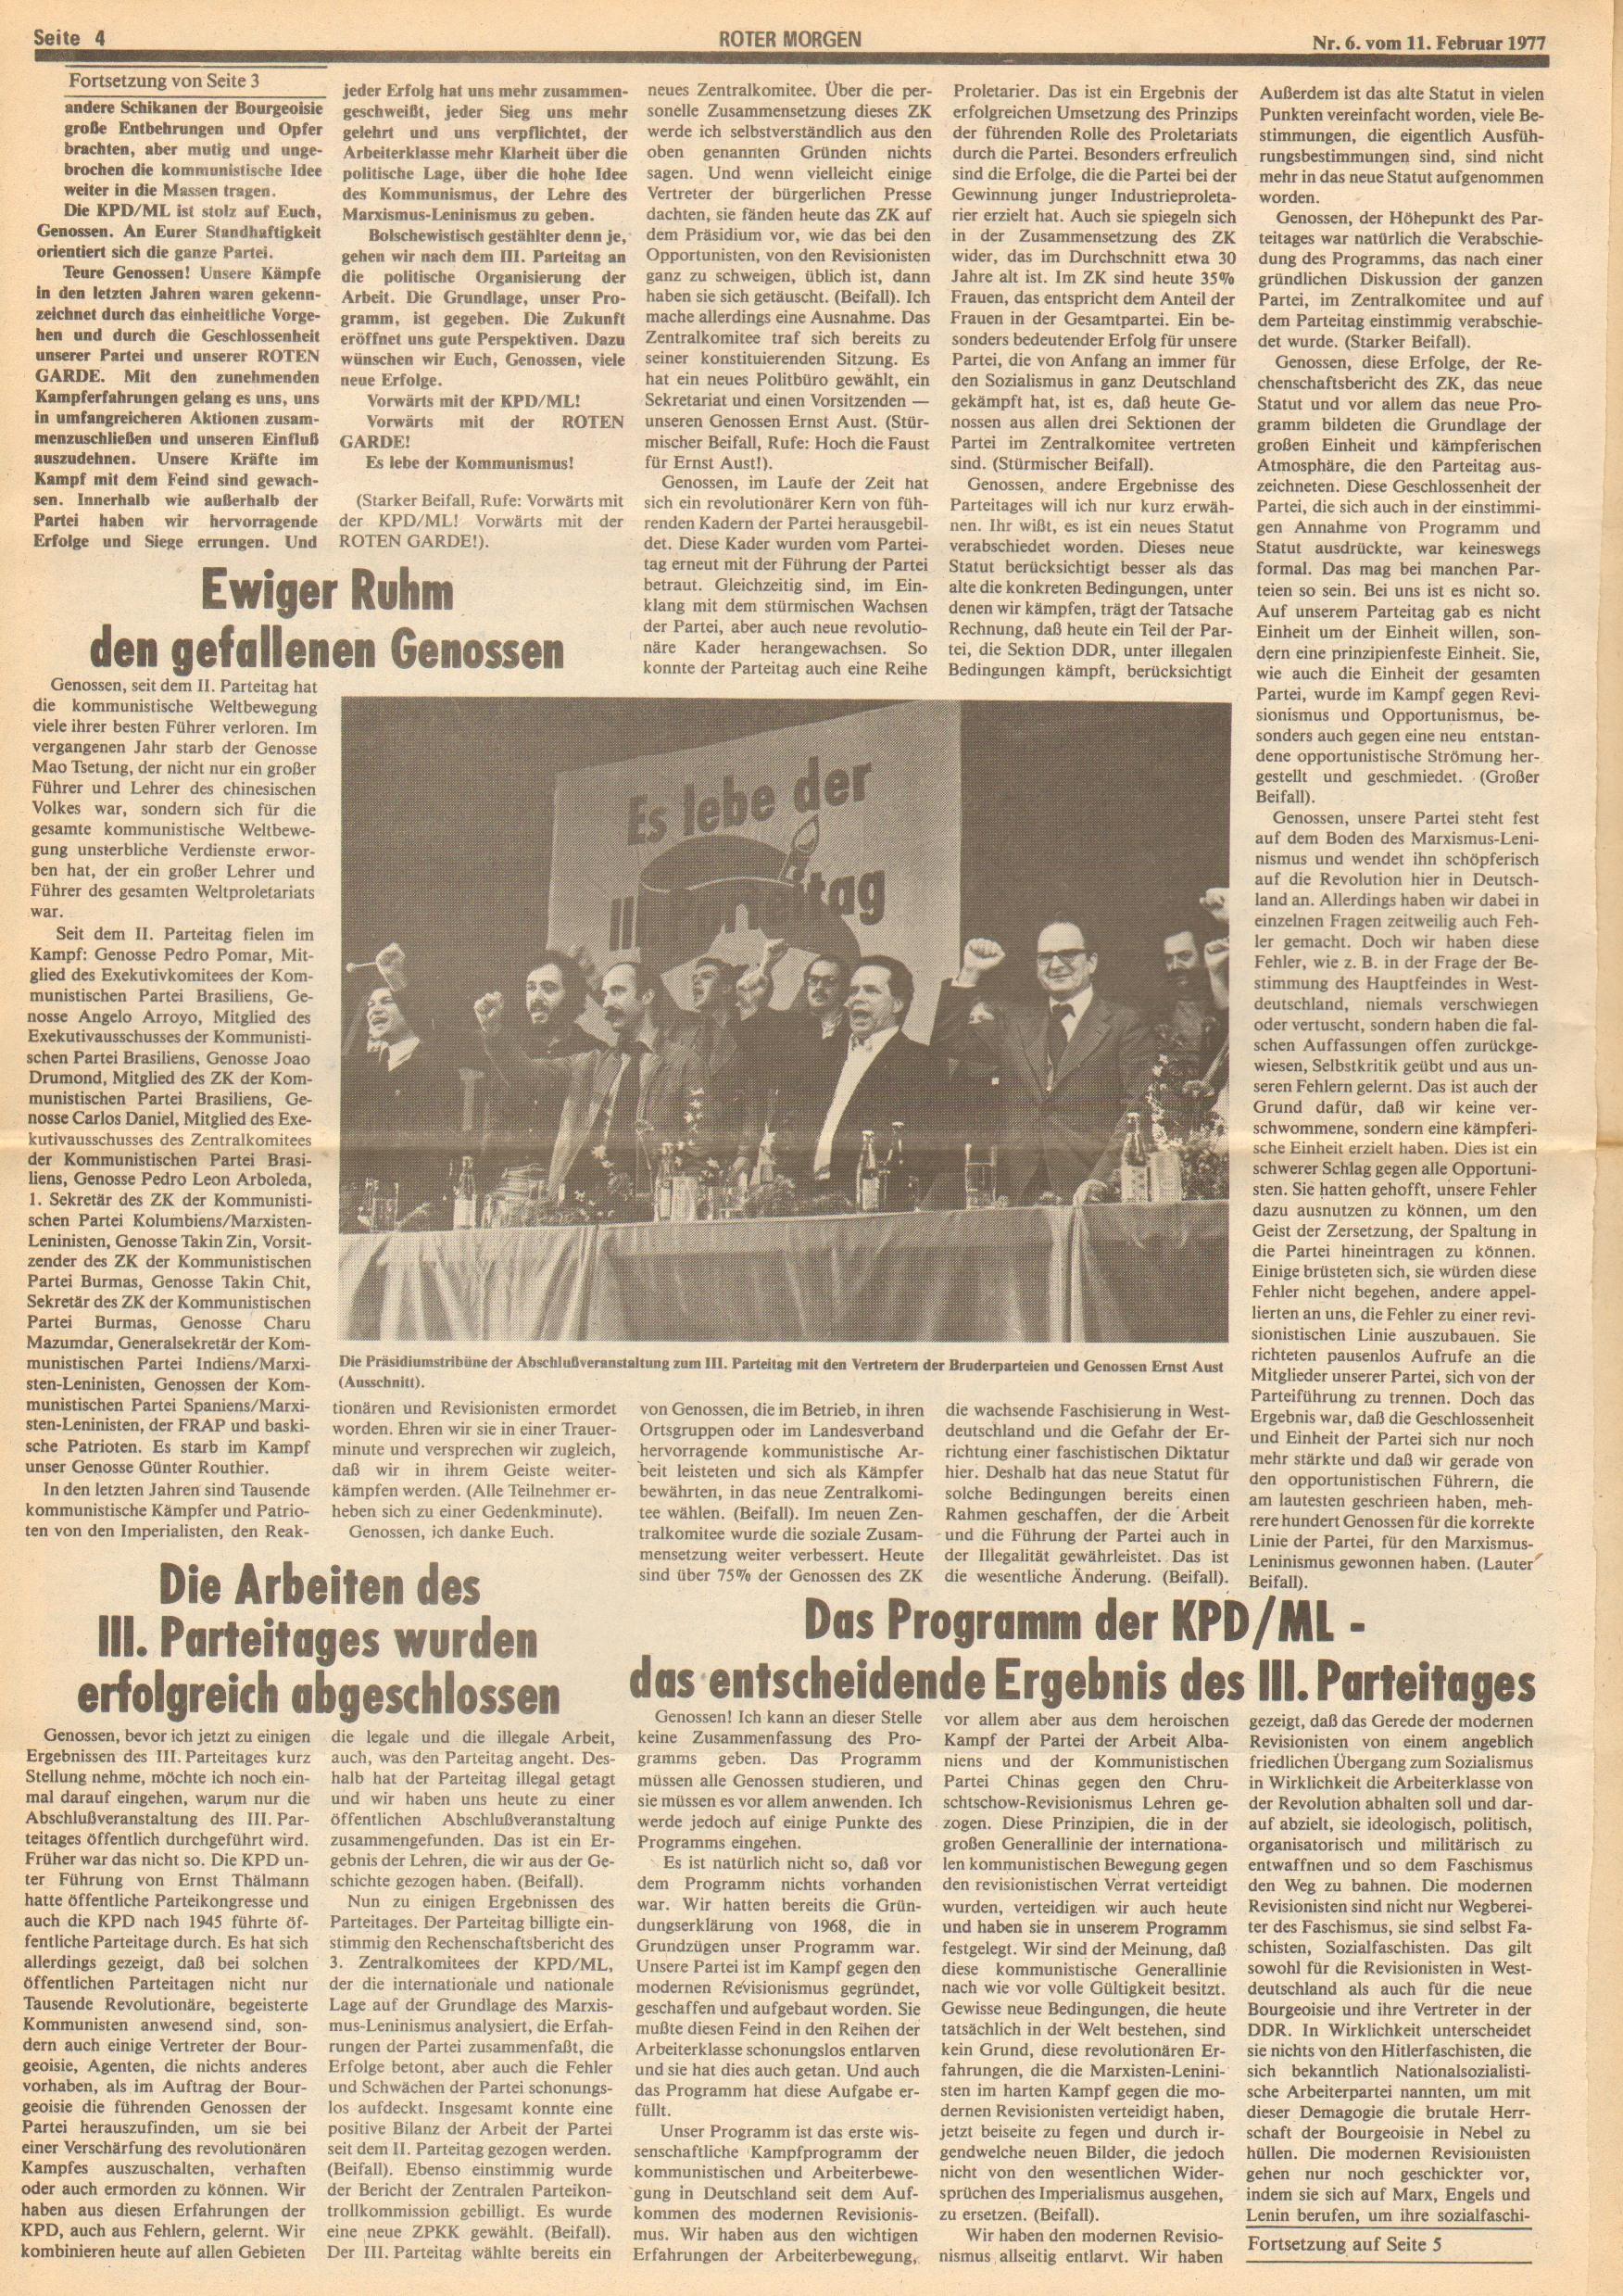 Roter Morgen, 11. Jg., 11. Februar 1977, Nr. 6, Seite 4